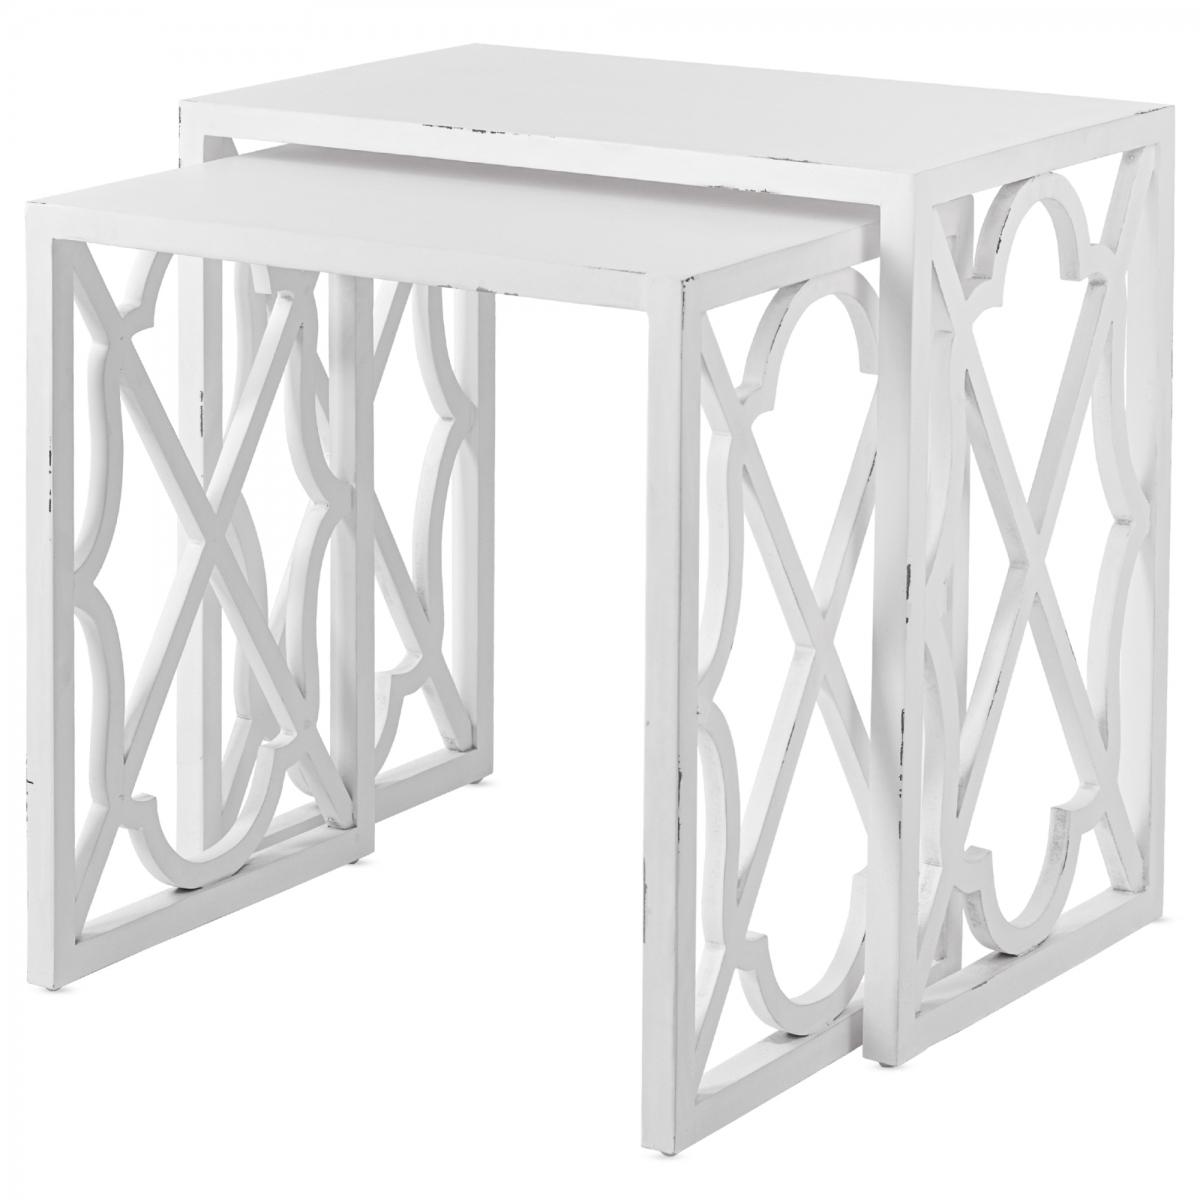 Комплект столиков Tommy Bahama Stovell Ferry Nesting Tables  - фото 1